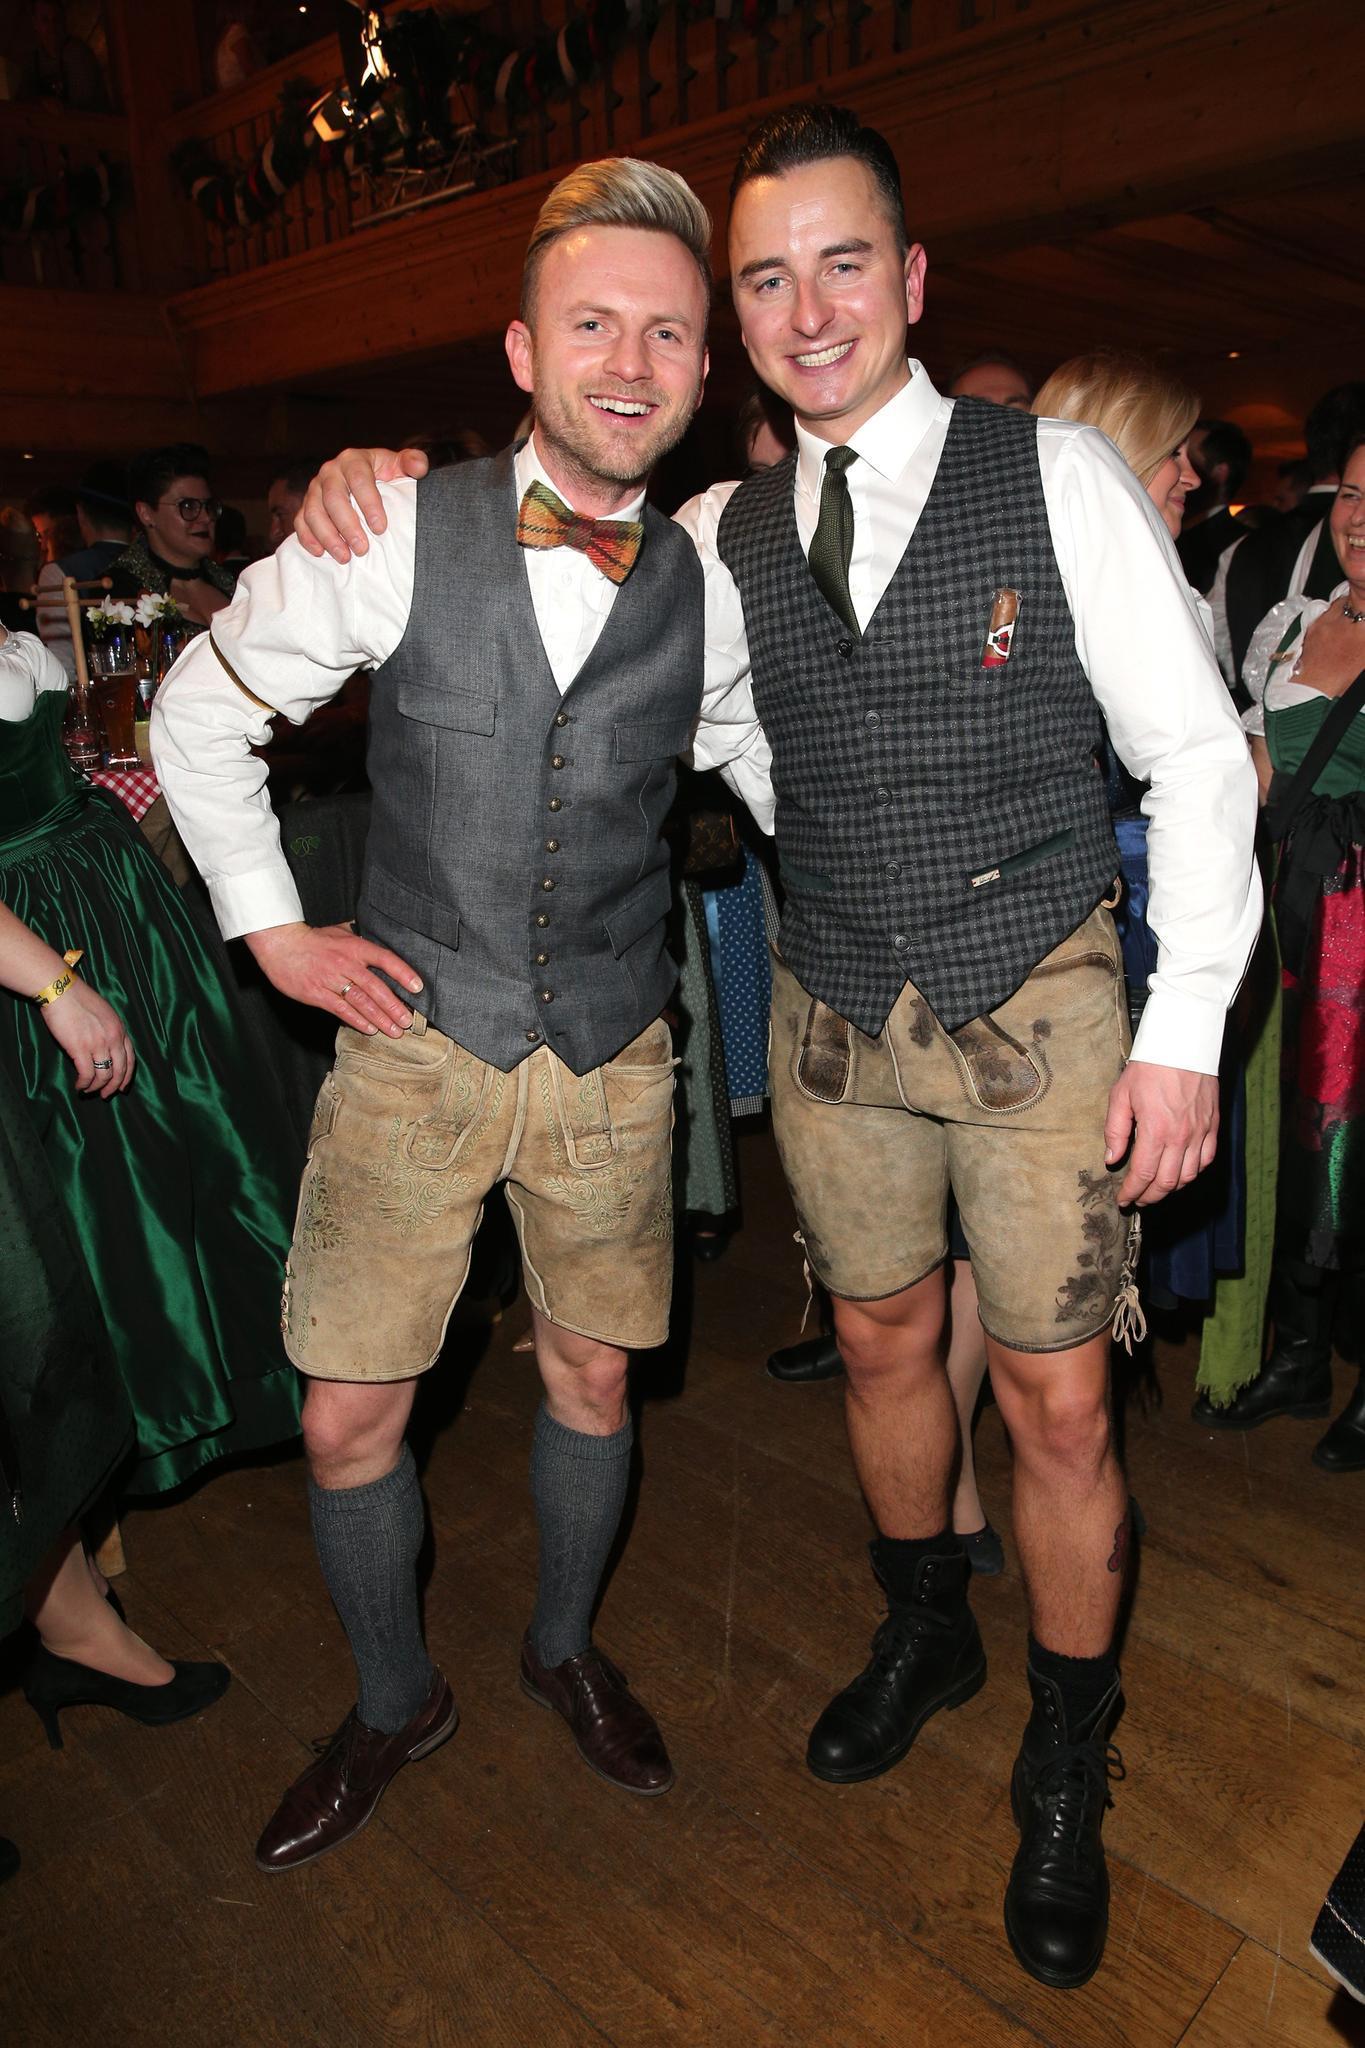 Willi Gabalier und Andreas Gabalier